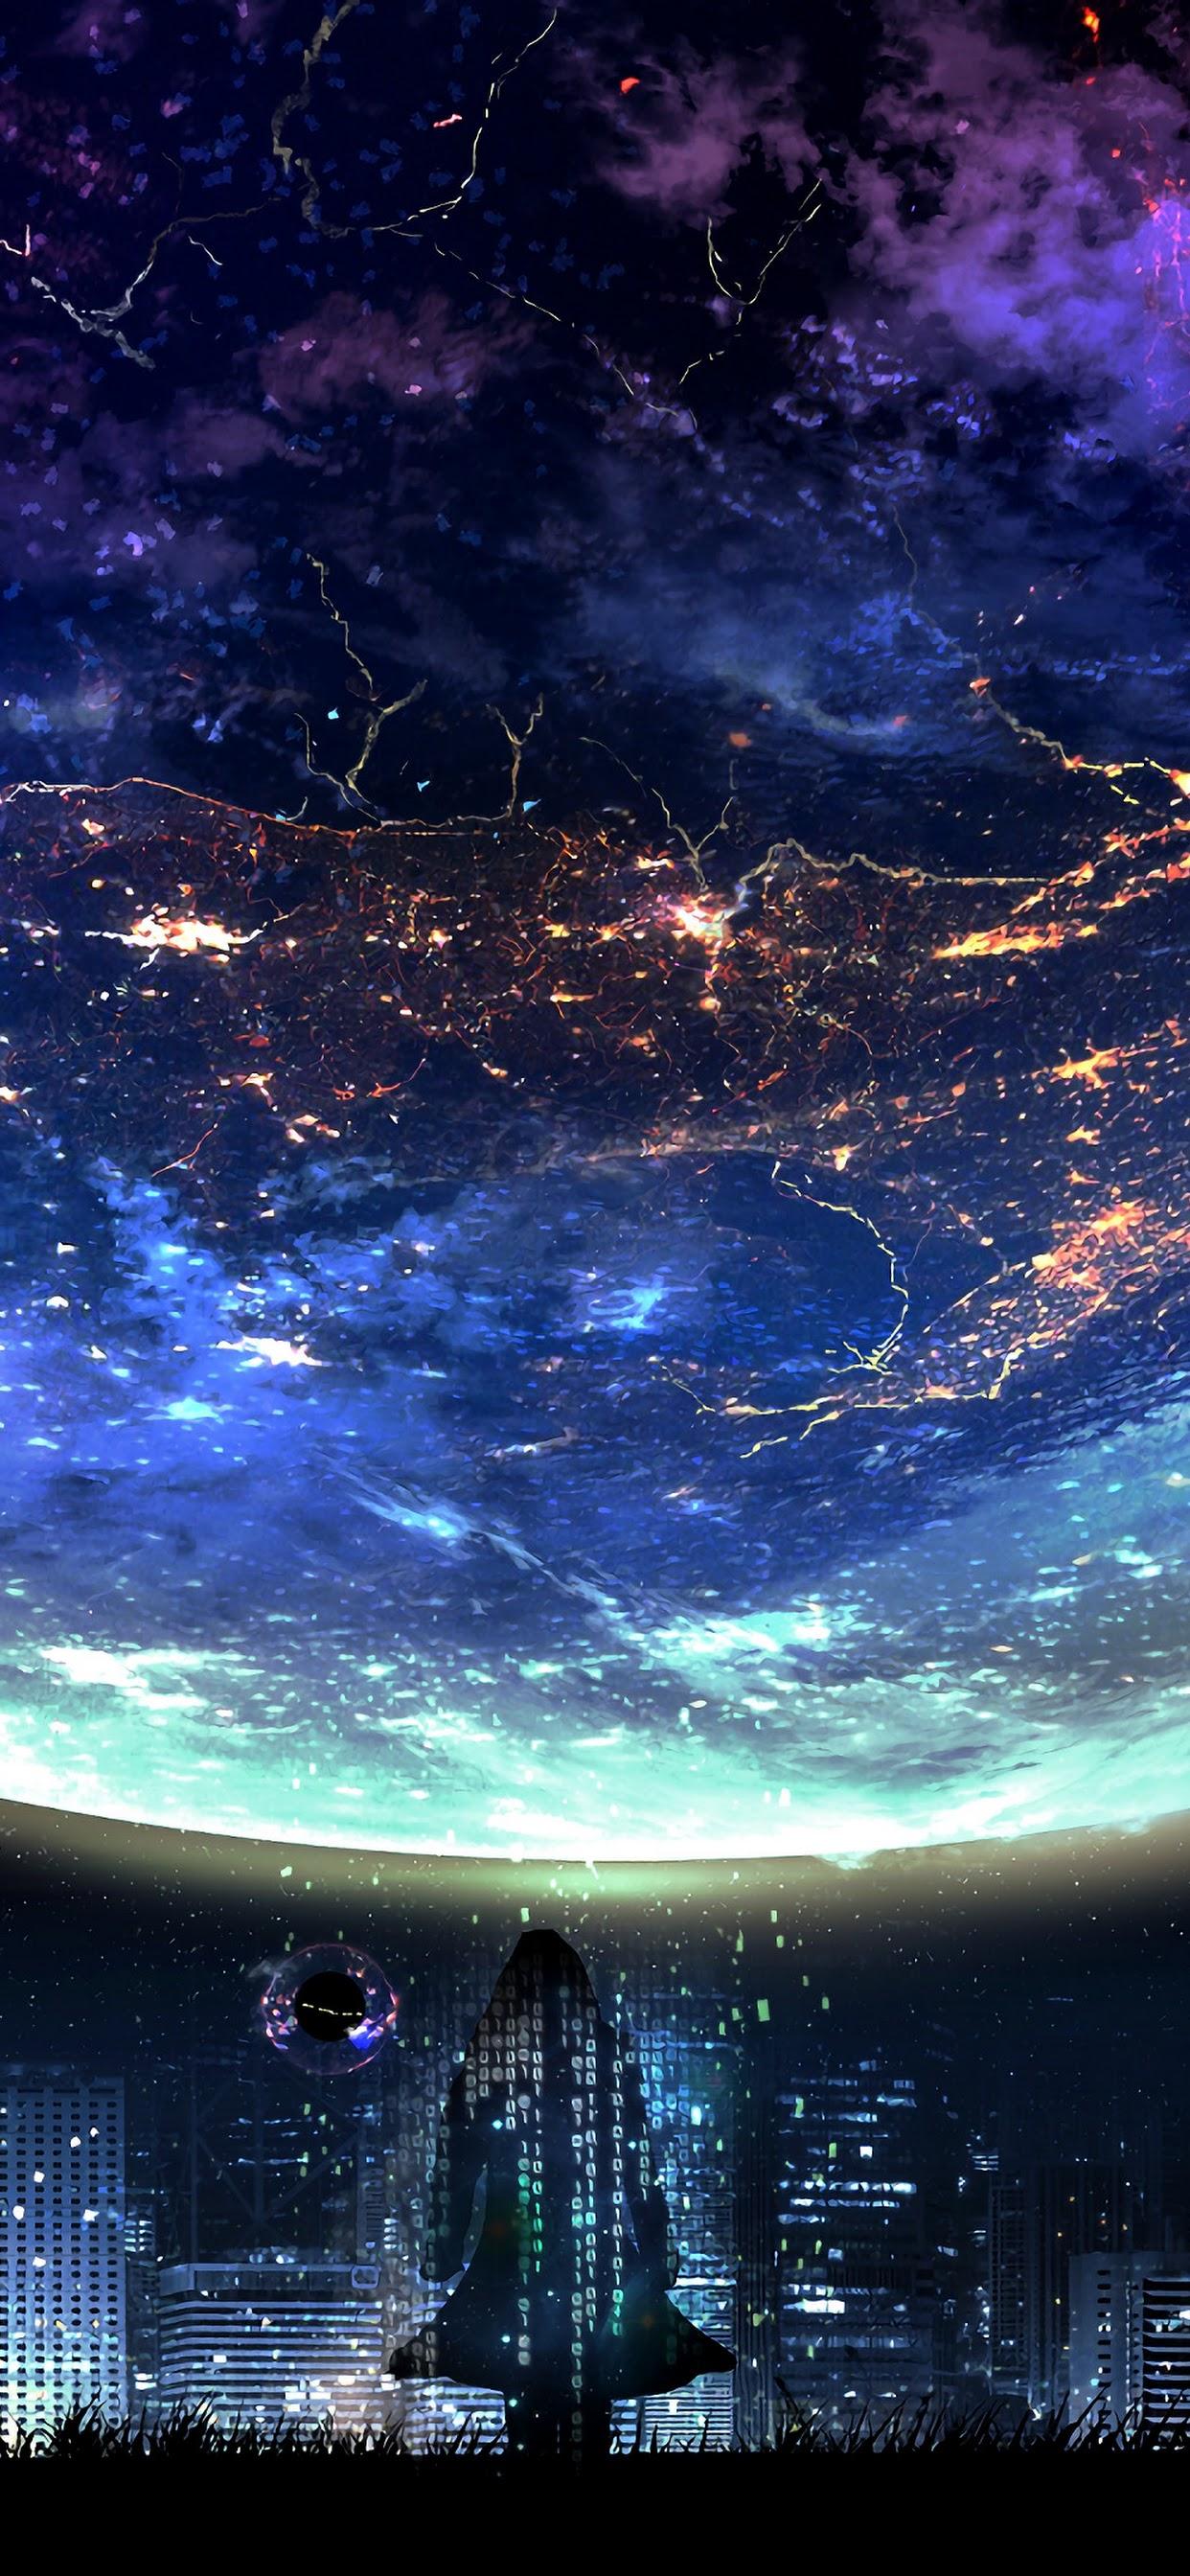 Planet Night City Landscape Scenery Anime 4k Wallpaper 117